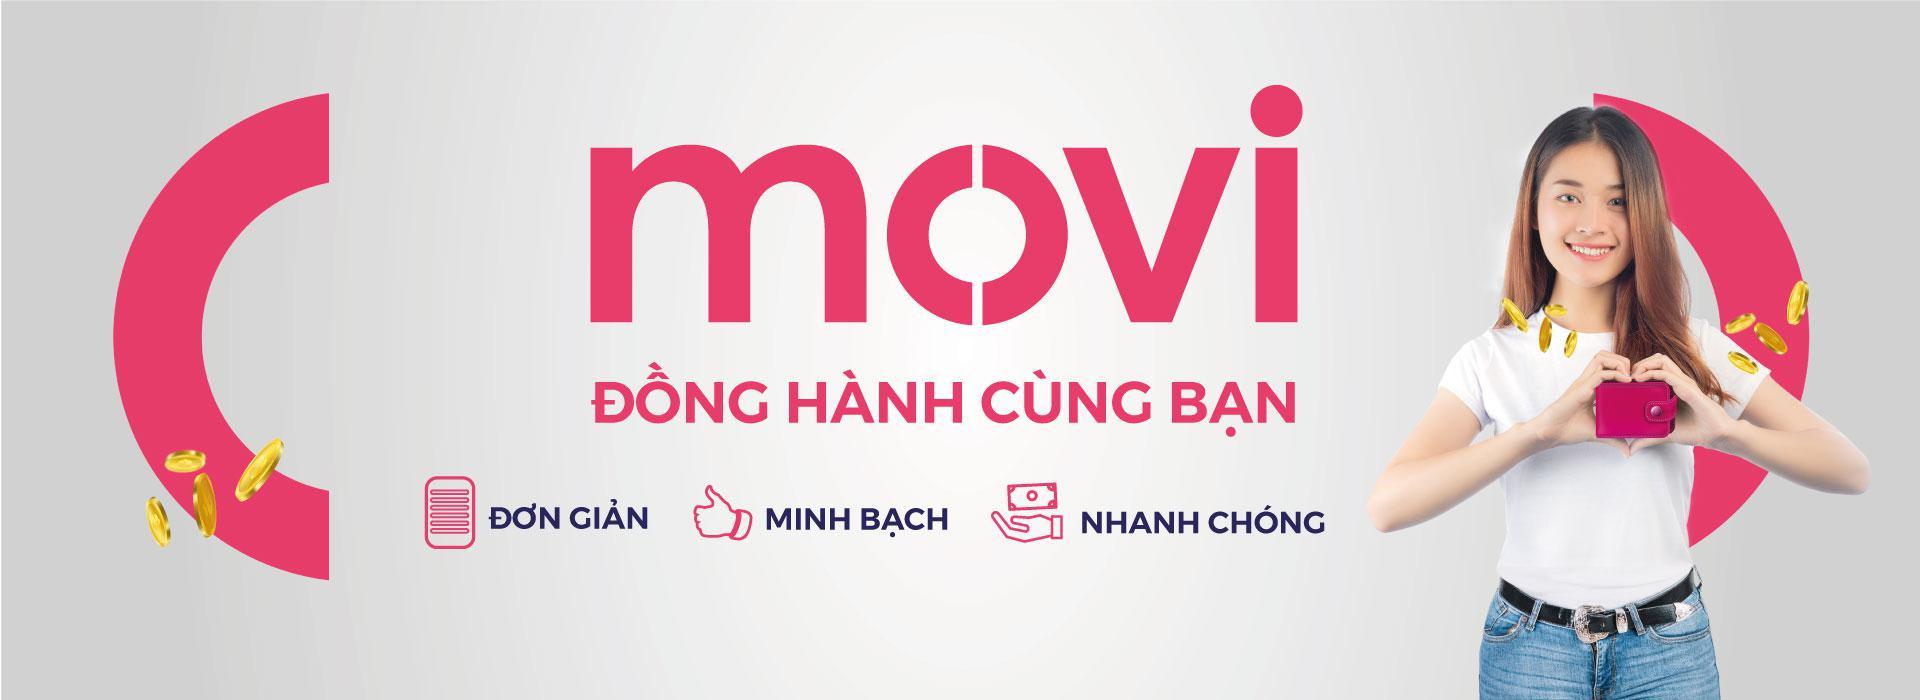 Movi Image